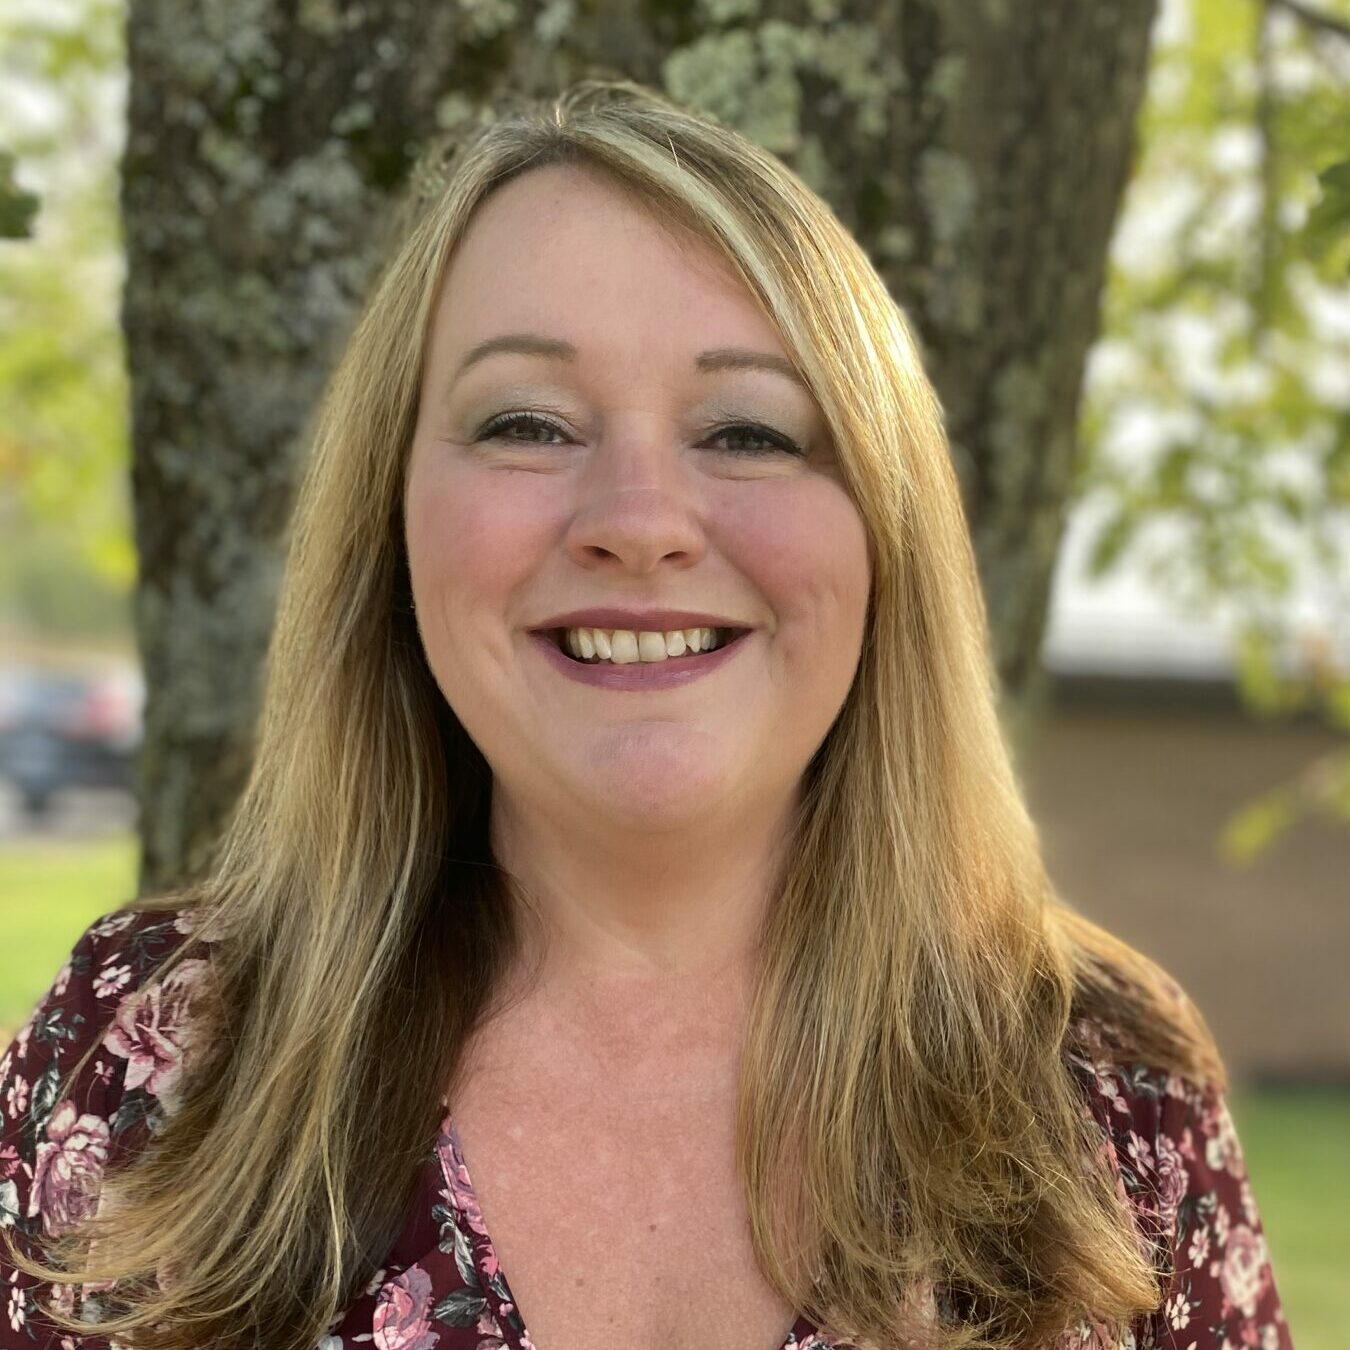 Headshot of Kerrie, Environmental Services Director at Stonerise Kingwood